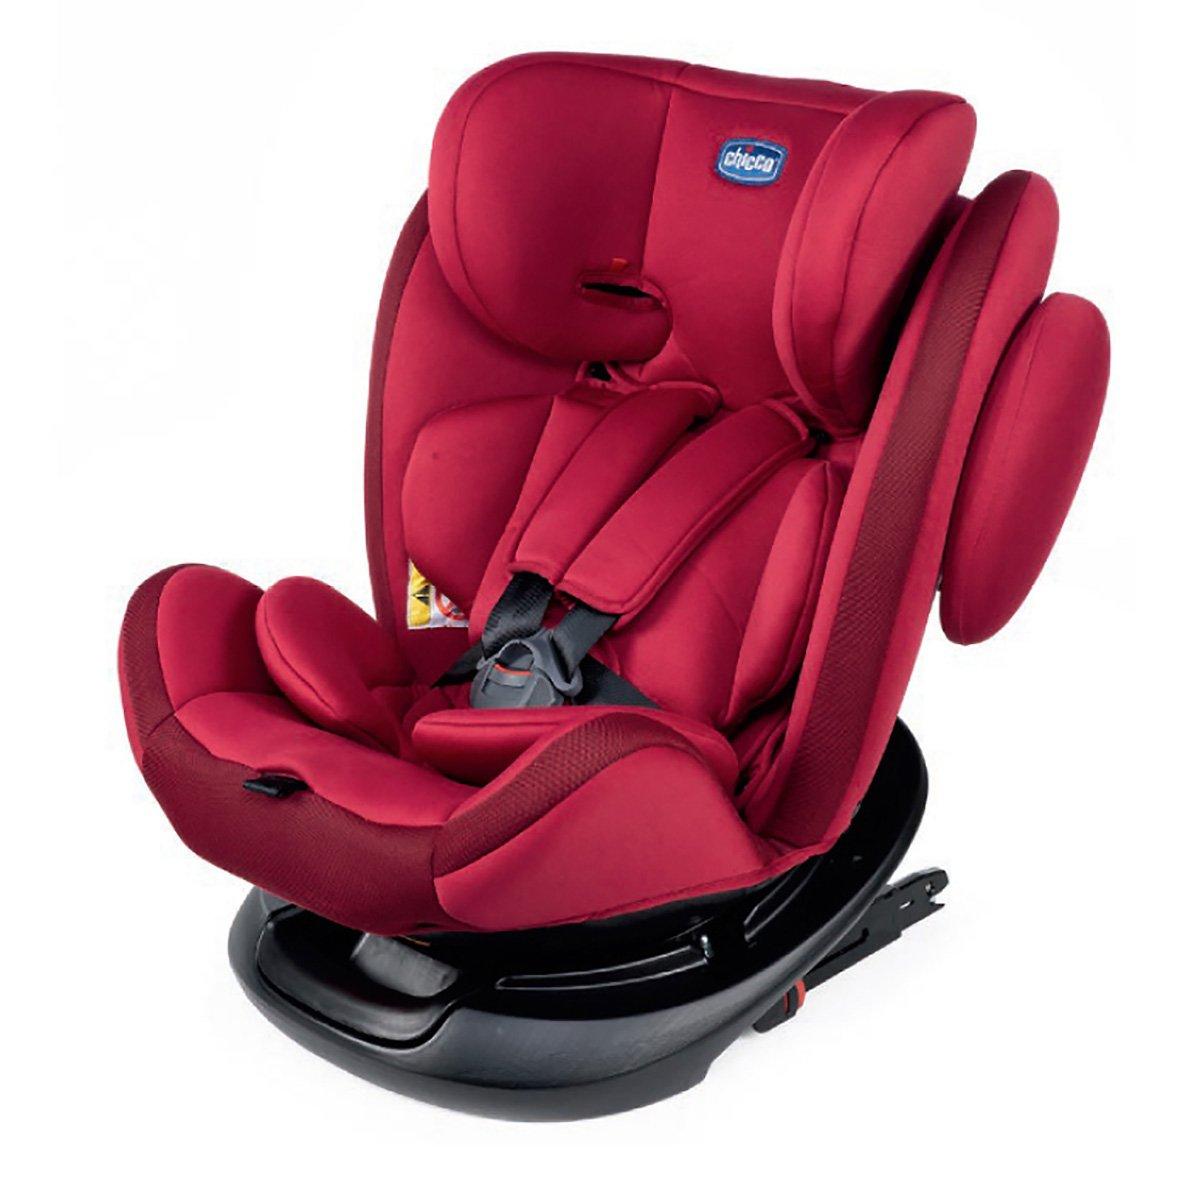 Scaun auto cuisofix Chicco Unico, Rotativ, grupa 0+/1/2/3, 0-36 kg, Rosu imagine